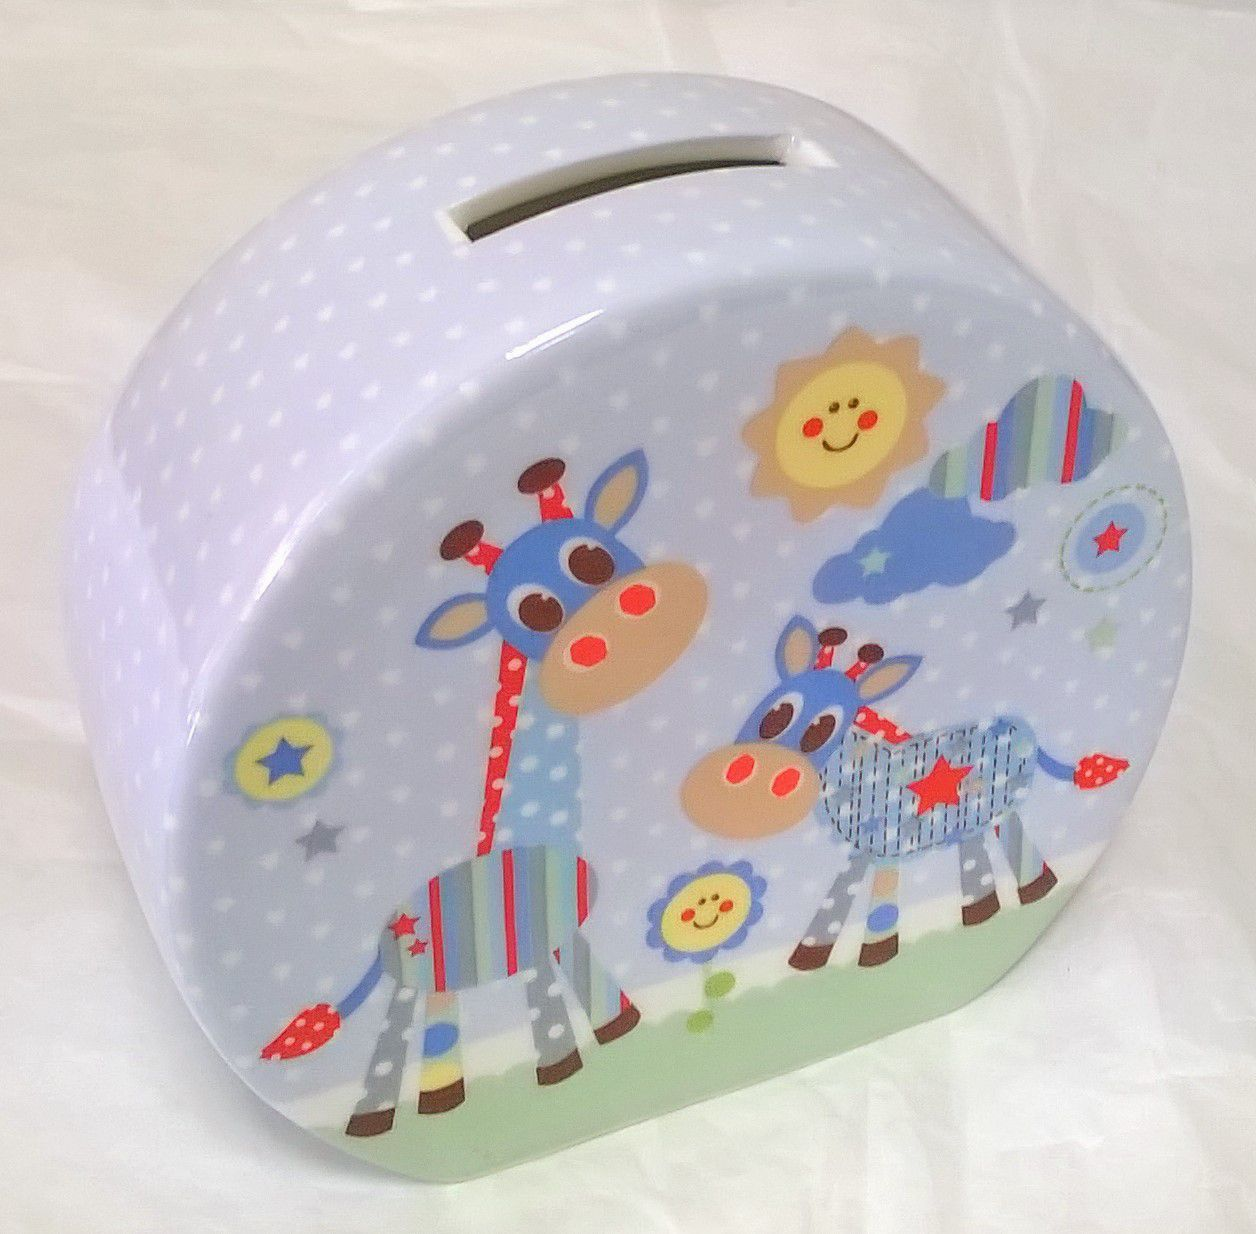 Little Sunshine Ceramic Money Box Blue by Leonardo LP33387